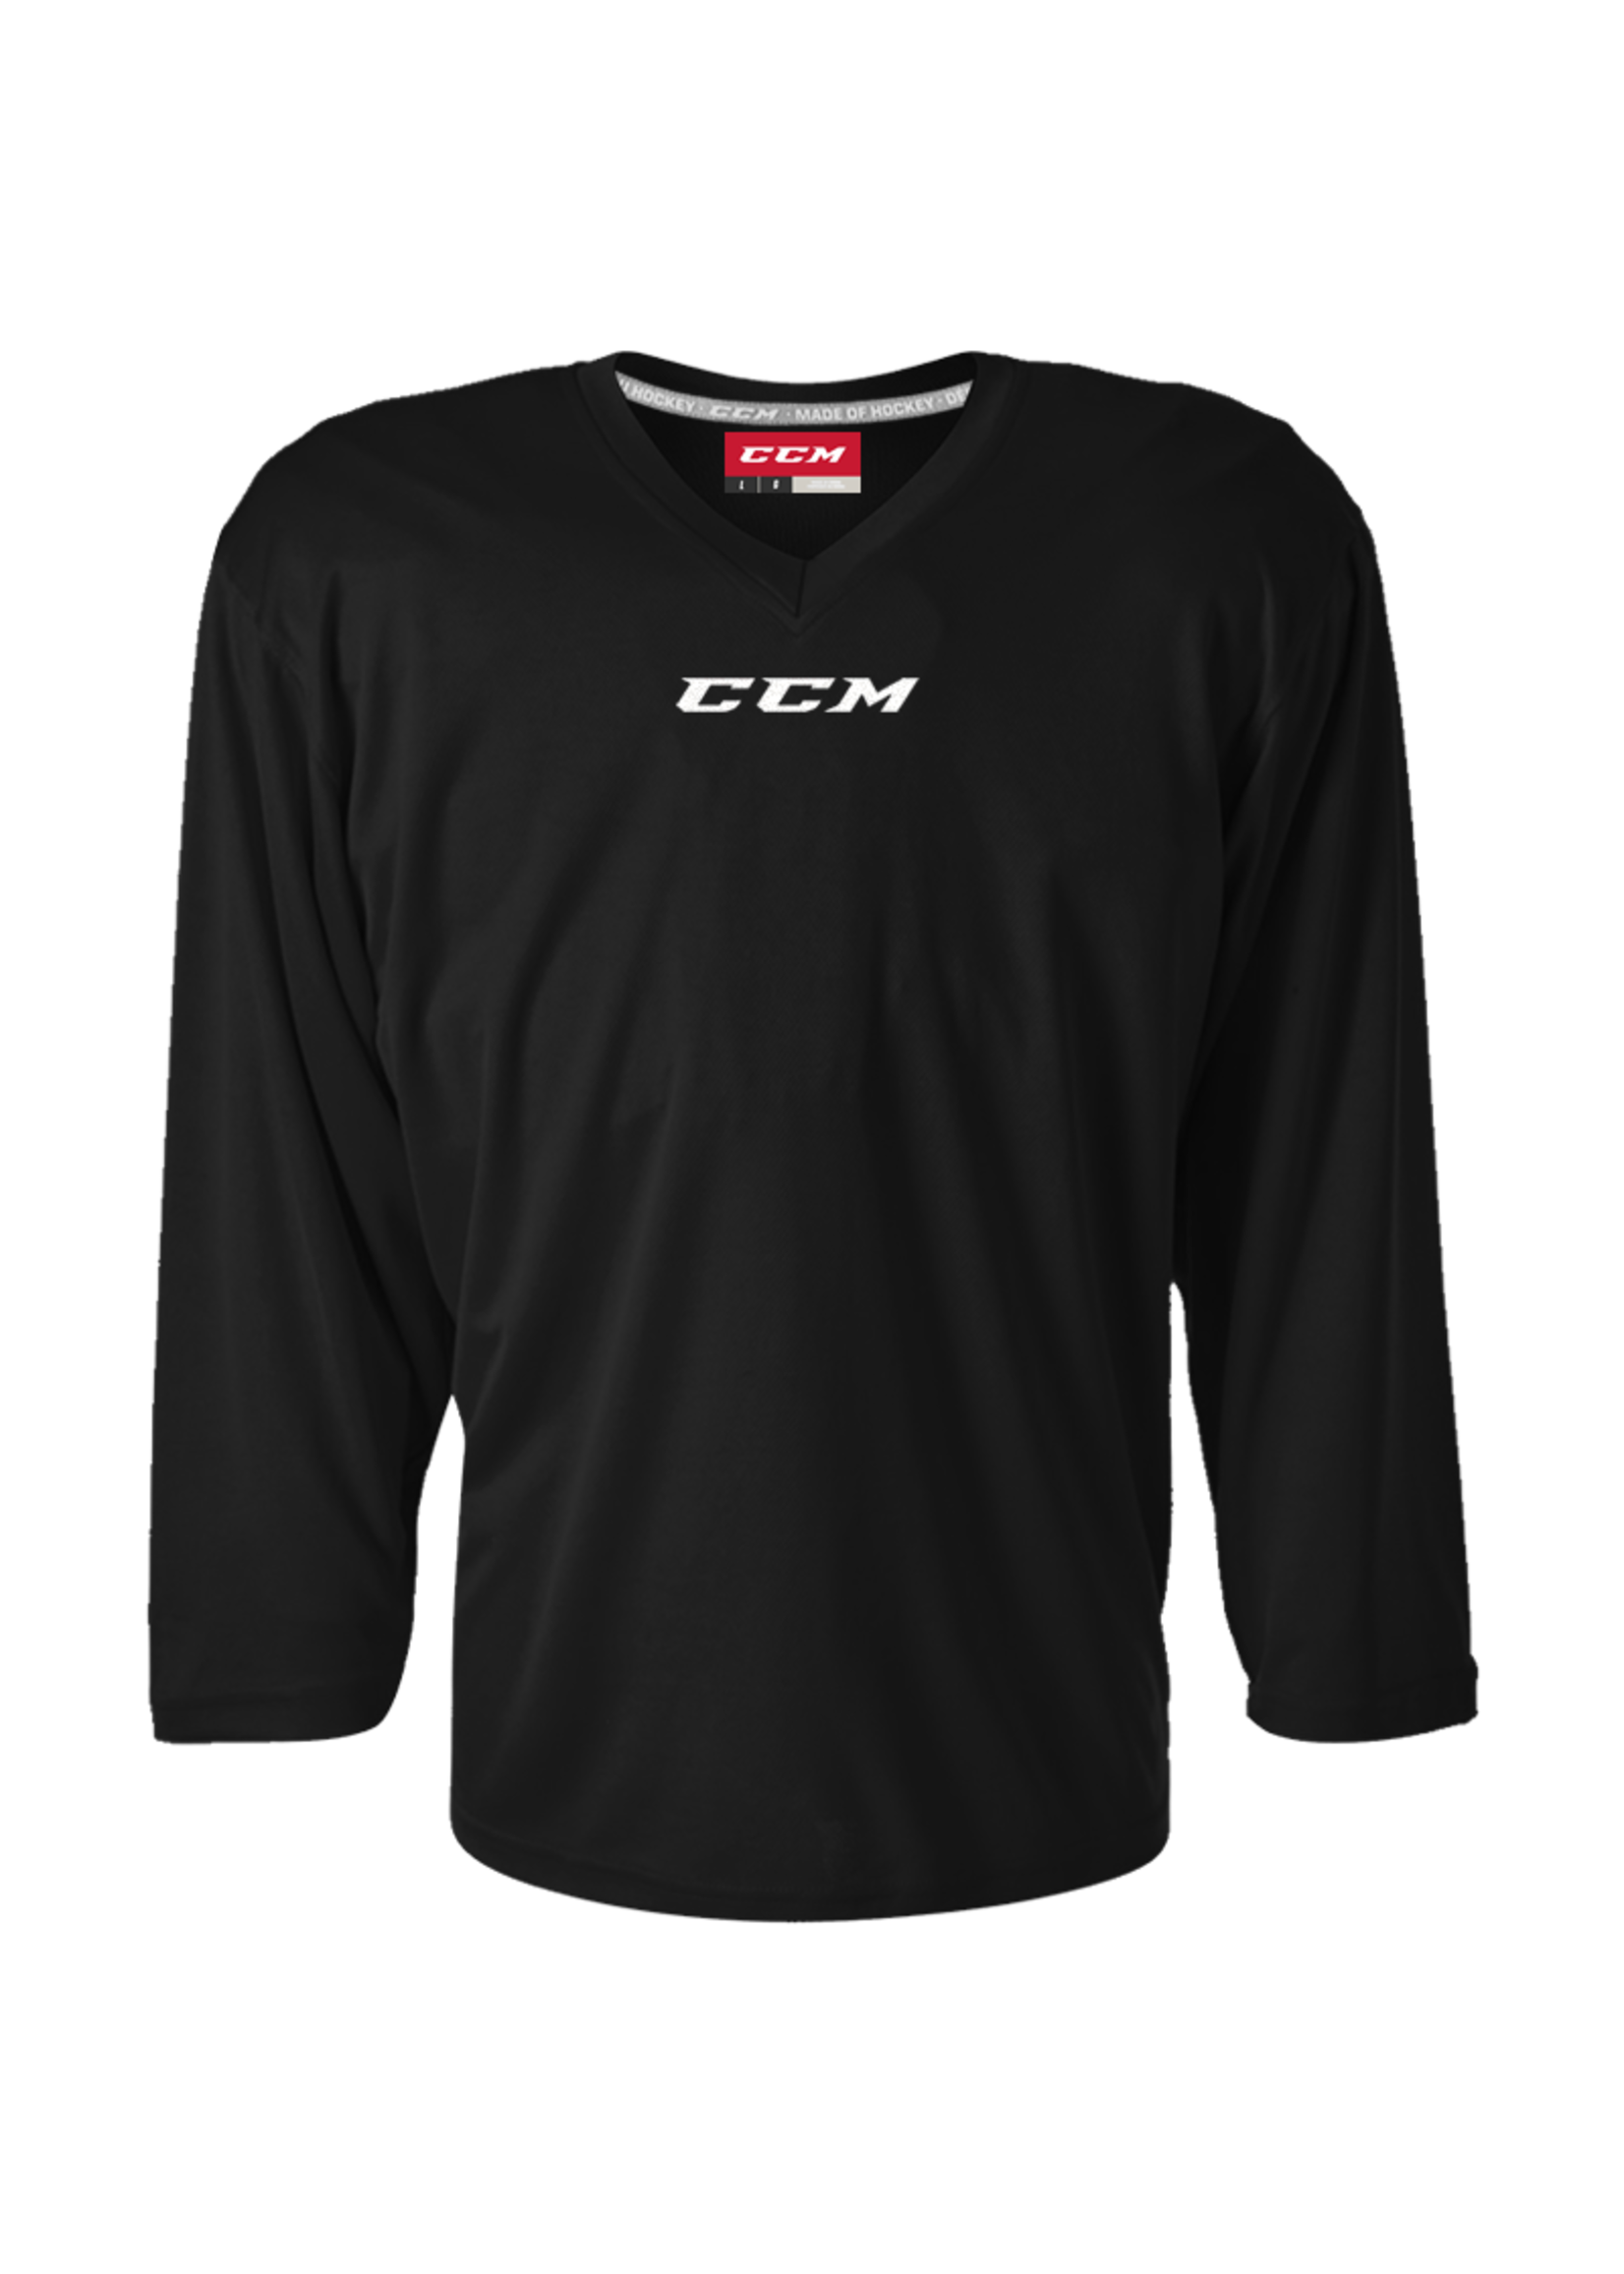 CCM Hockey CCM 5000 HOCKEY PRACTICE JERSEY JR